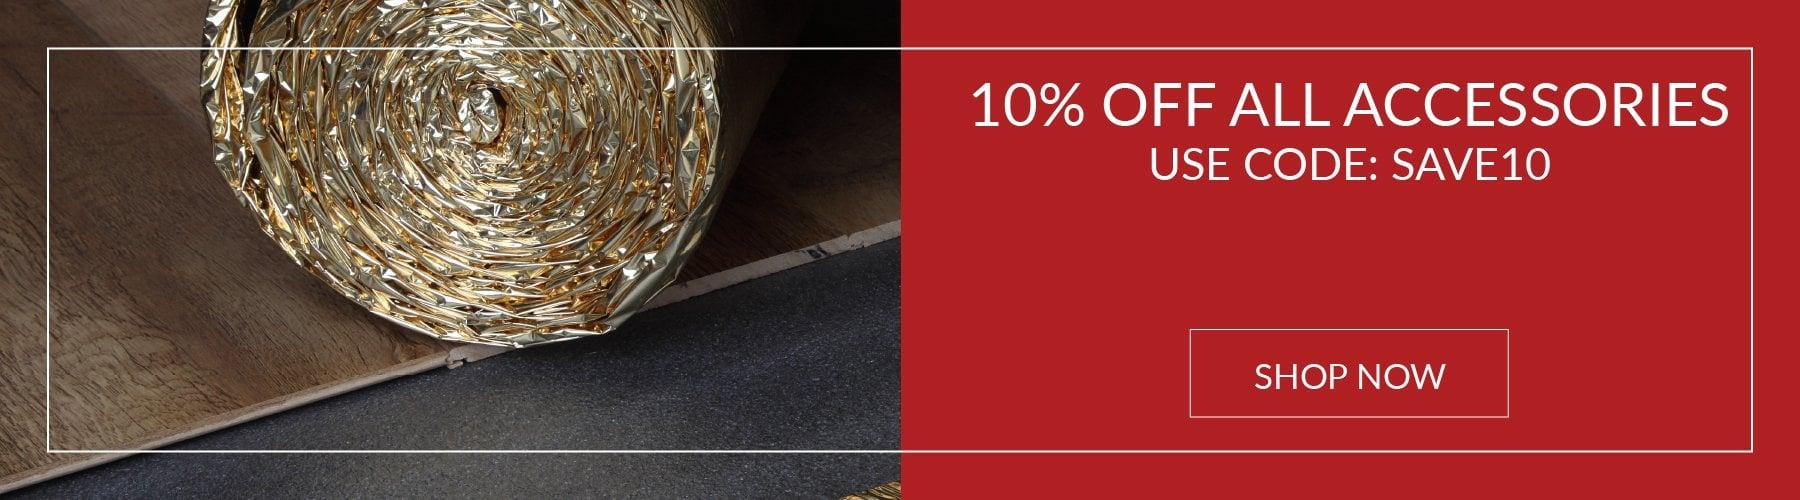 10% Accessories